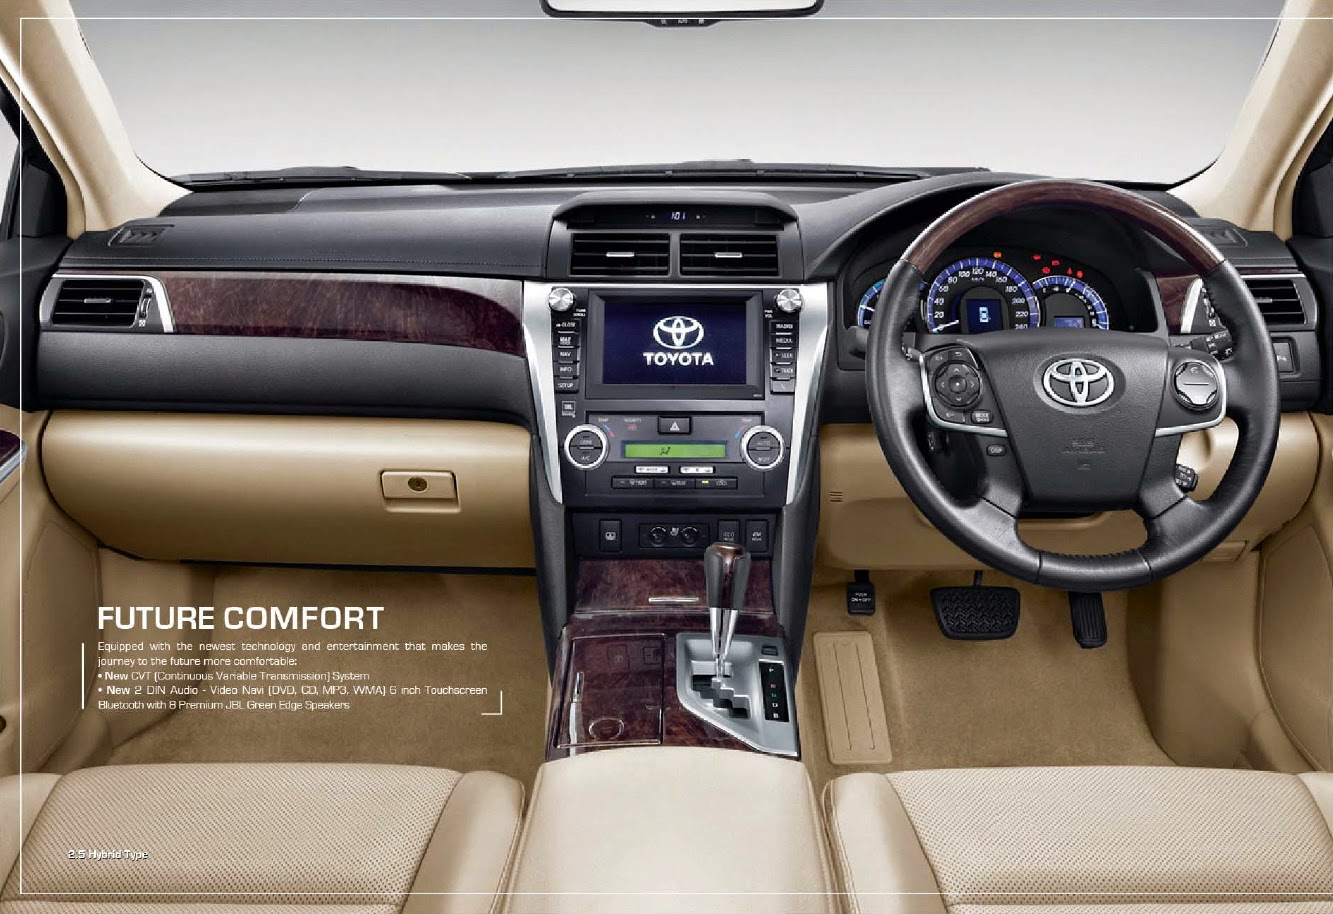 all new camry hybrid indonesia reset alarm grand avanza mobil terbaik agel pendukung seo